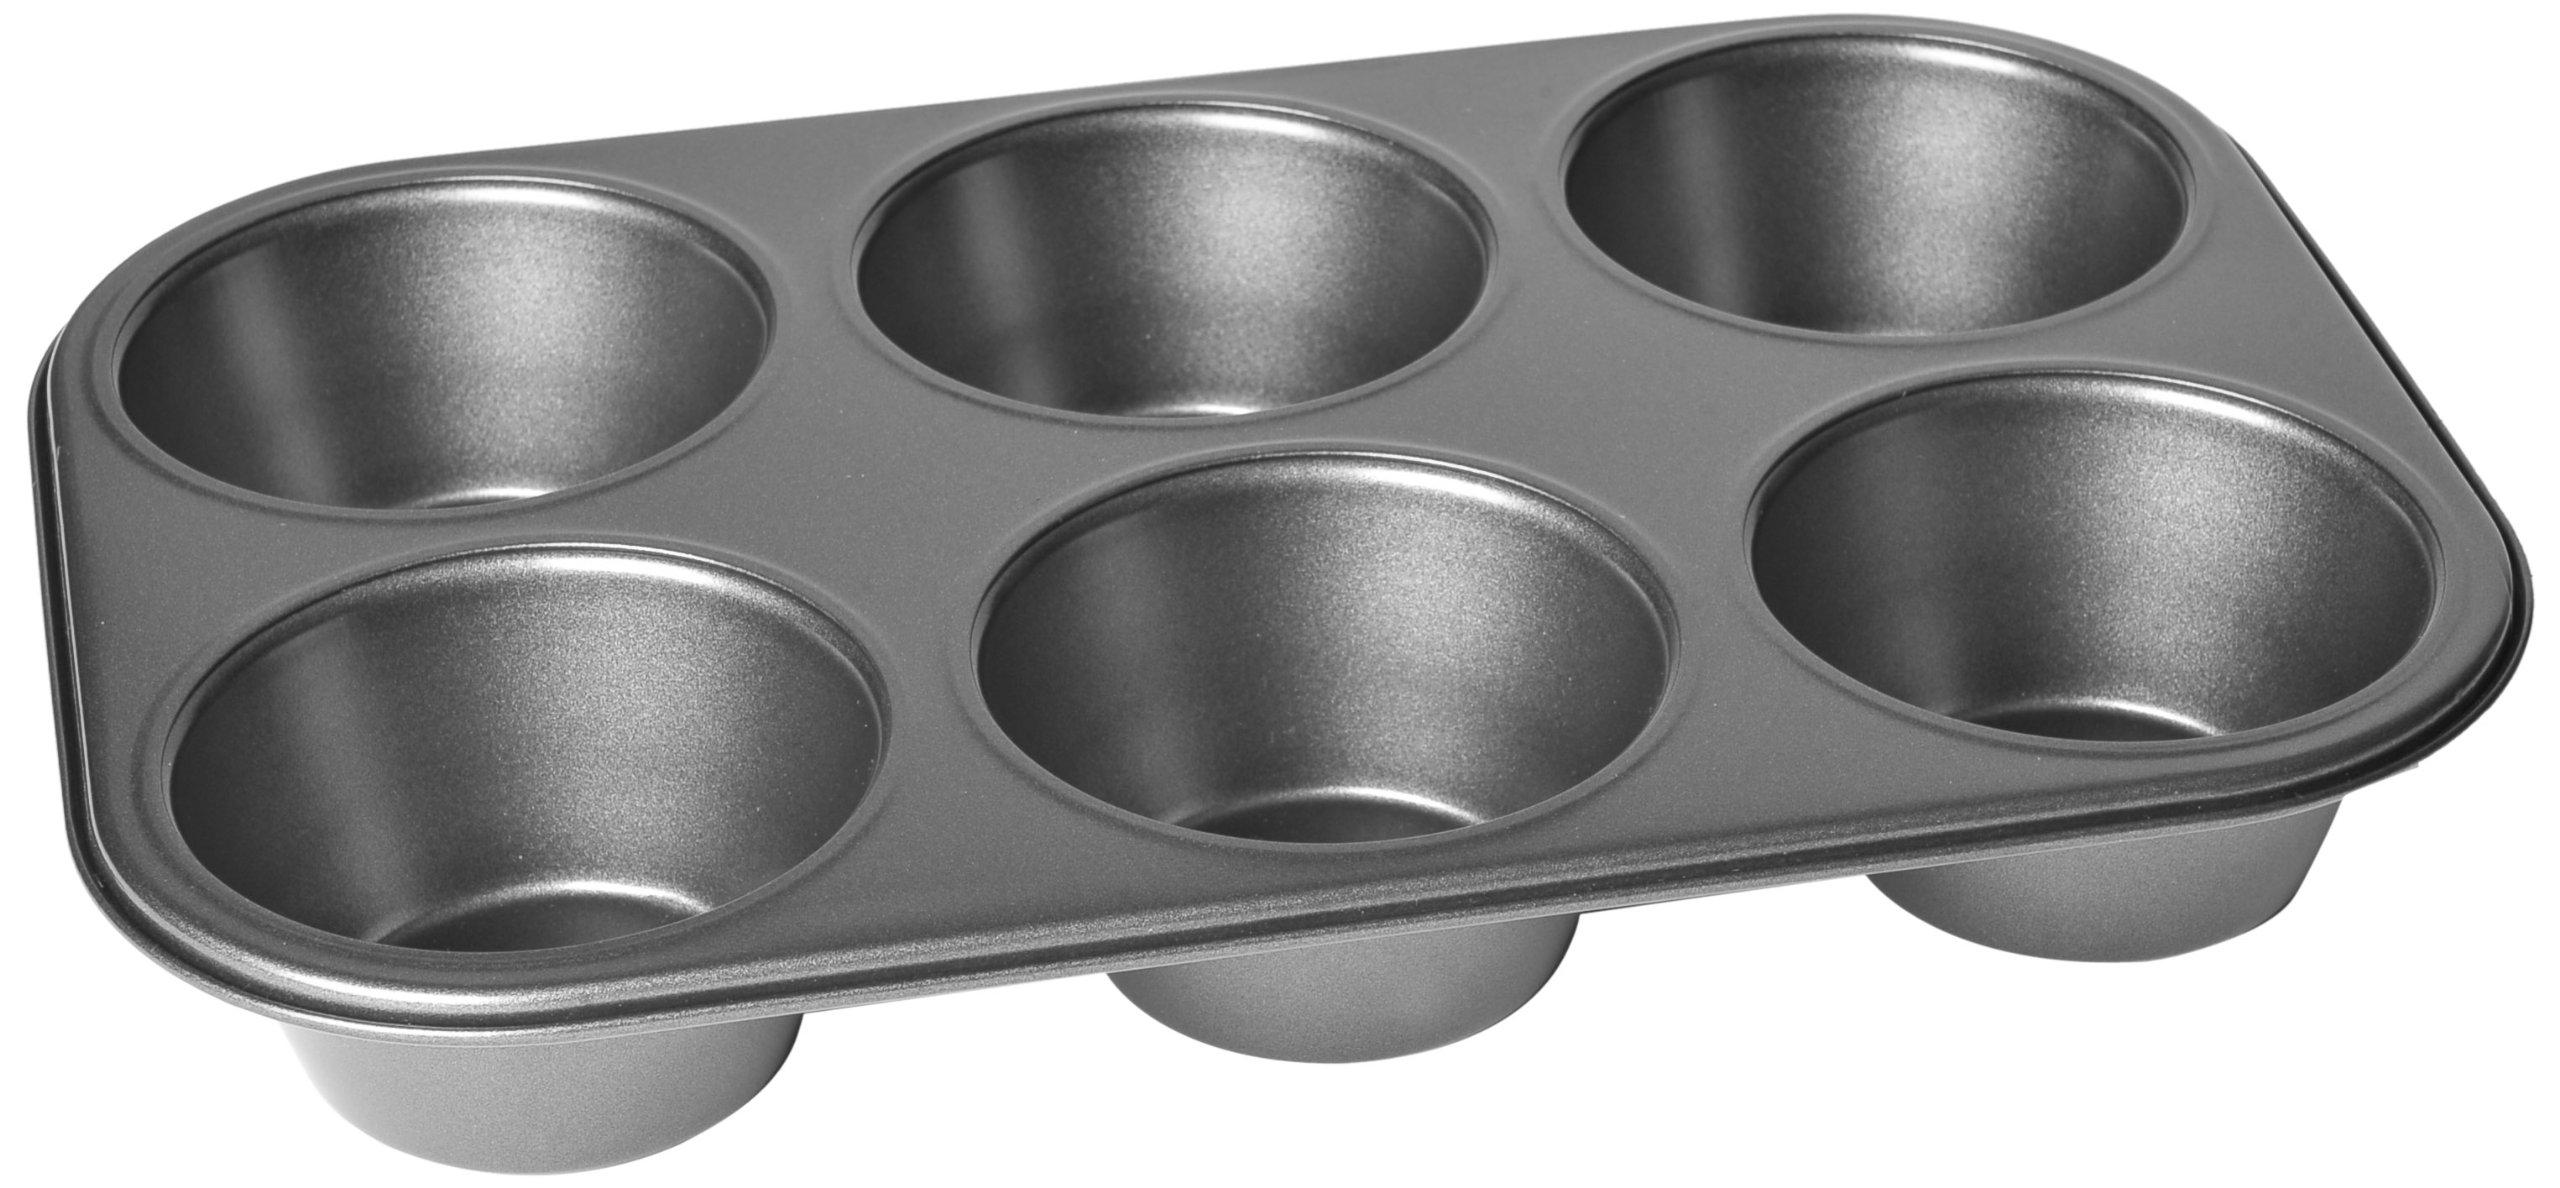 Chloe's Kitchen 201-133 Muffin Pan, Jumbo 6-Cavity, Non-Stick by MDC Housewares Inc.